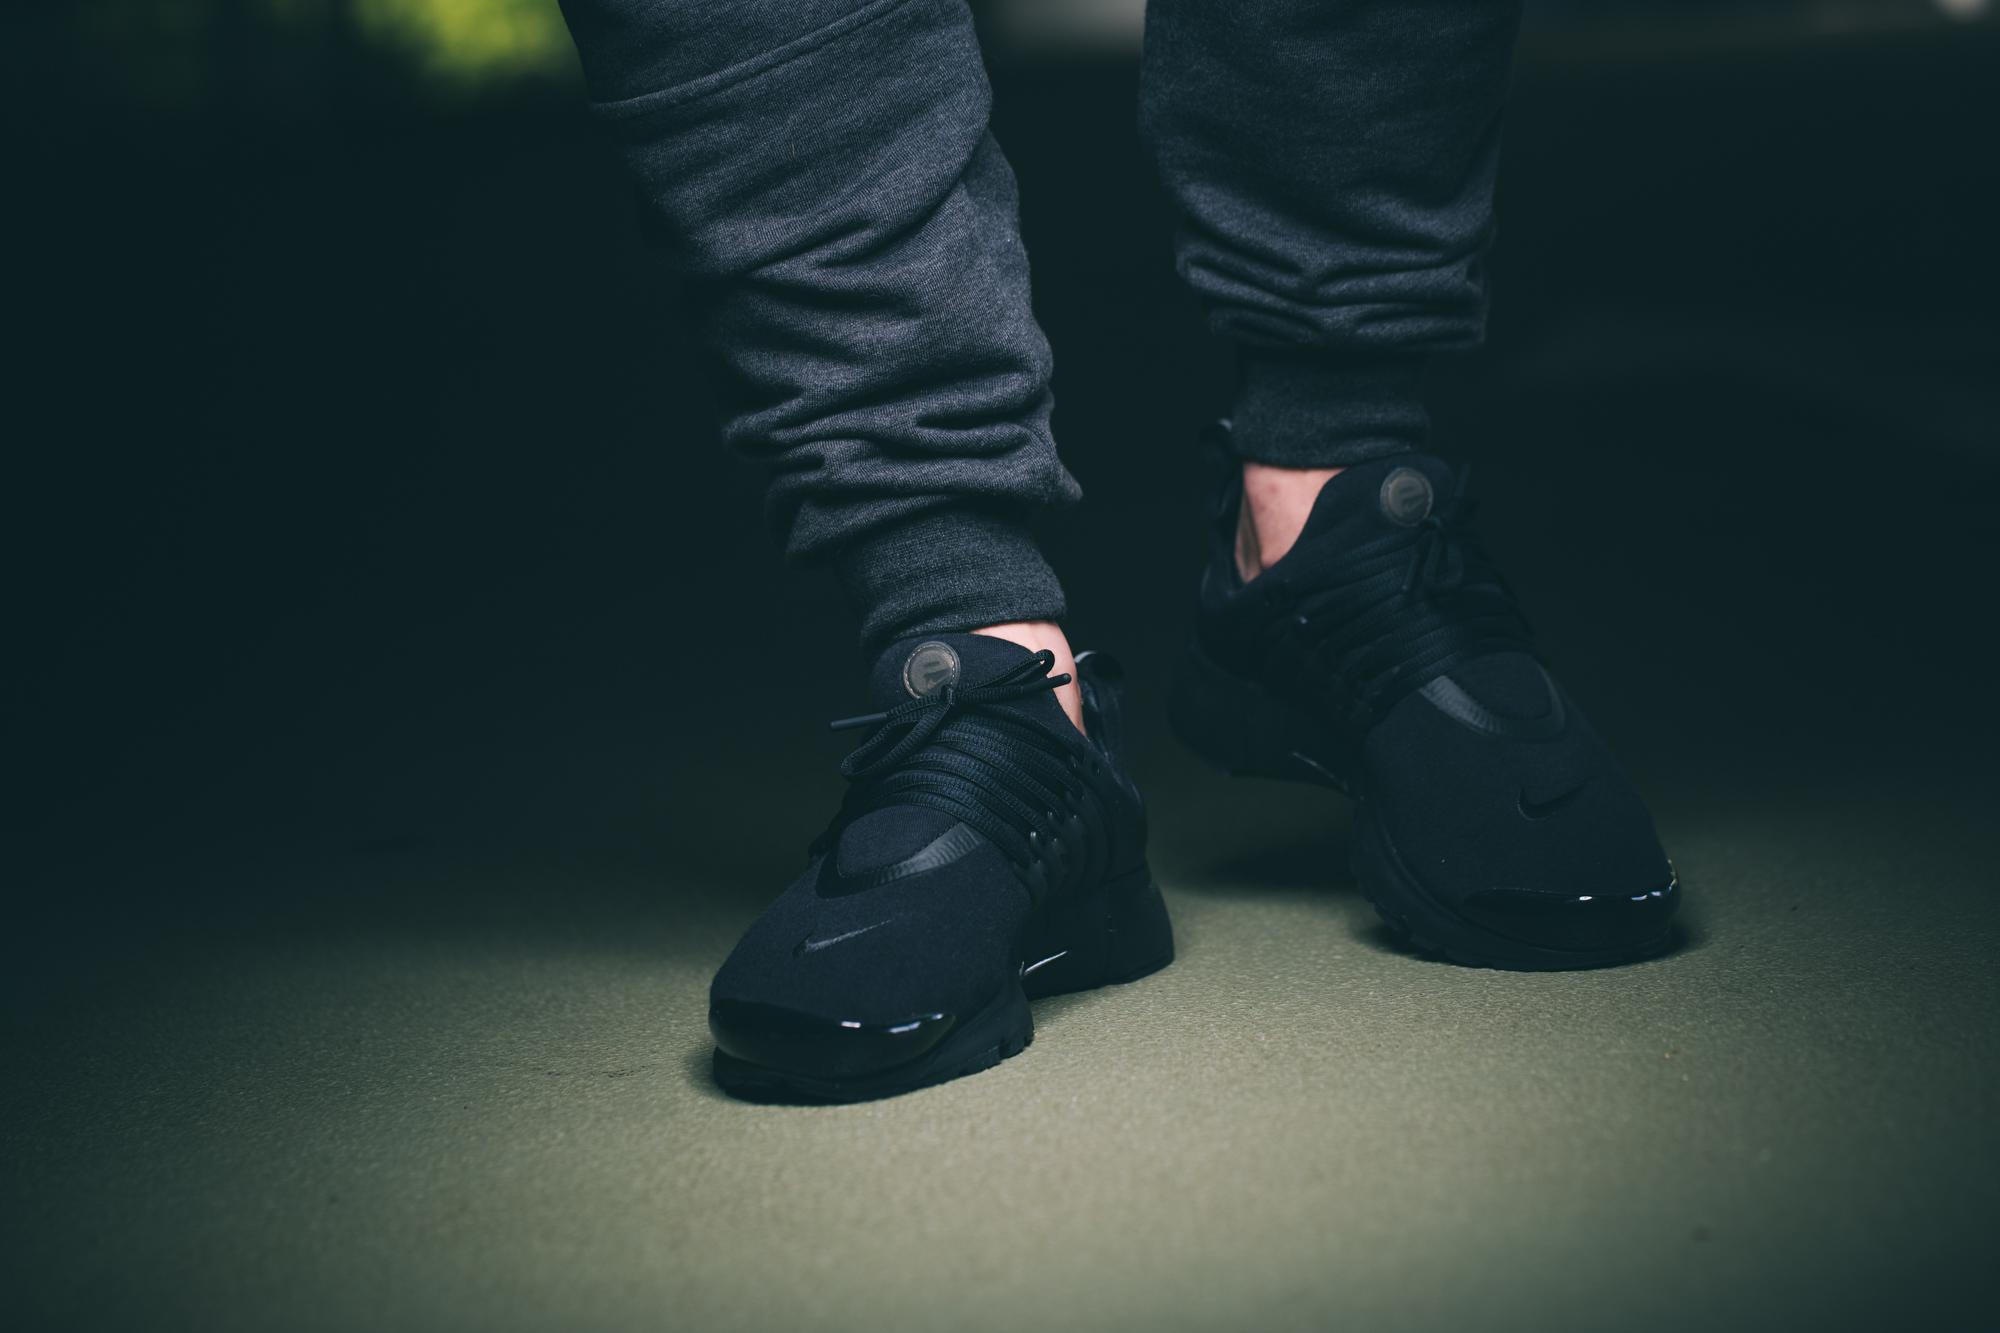 grand choix de 8eaad d65c1 Nike Air Presto Tech Fleece Femme